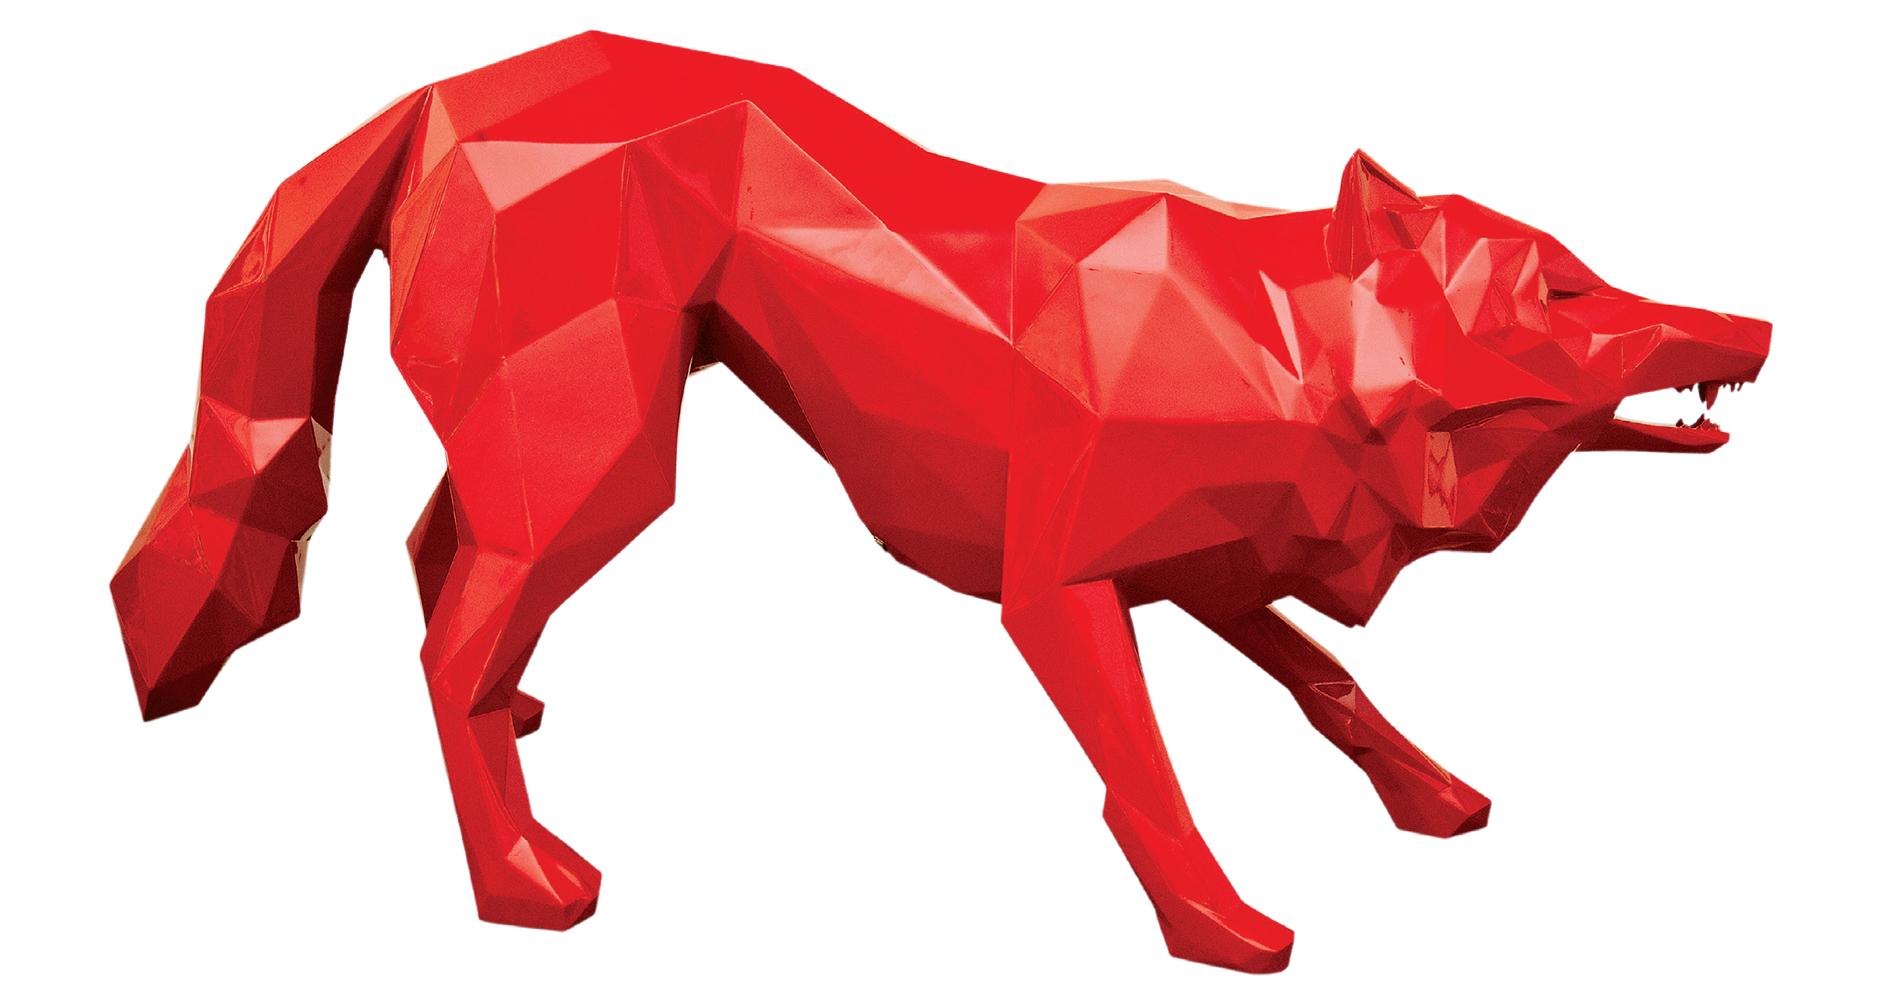 Raging Wolf by Richard Orlinski